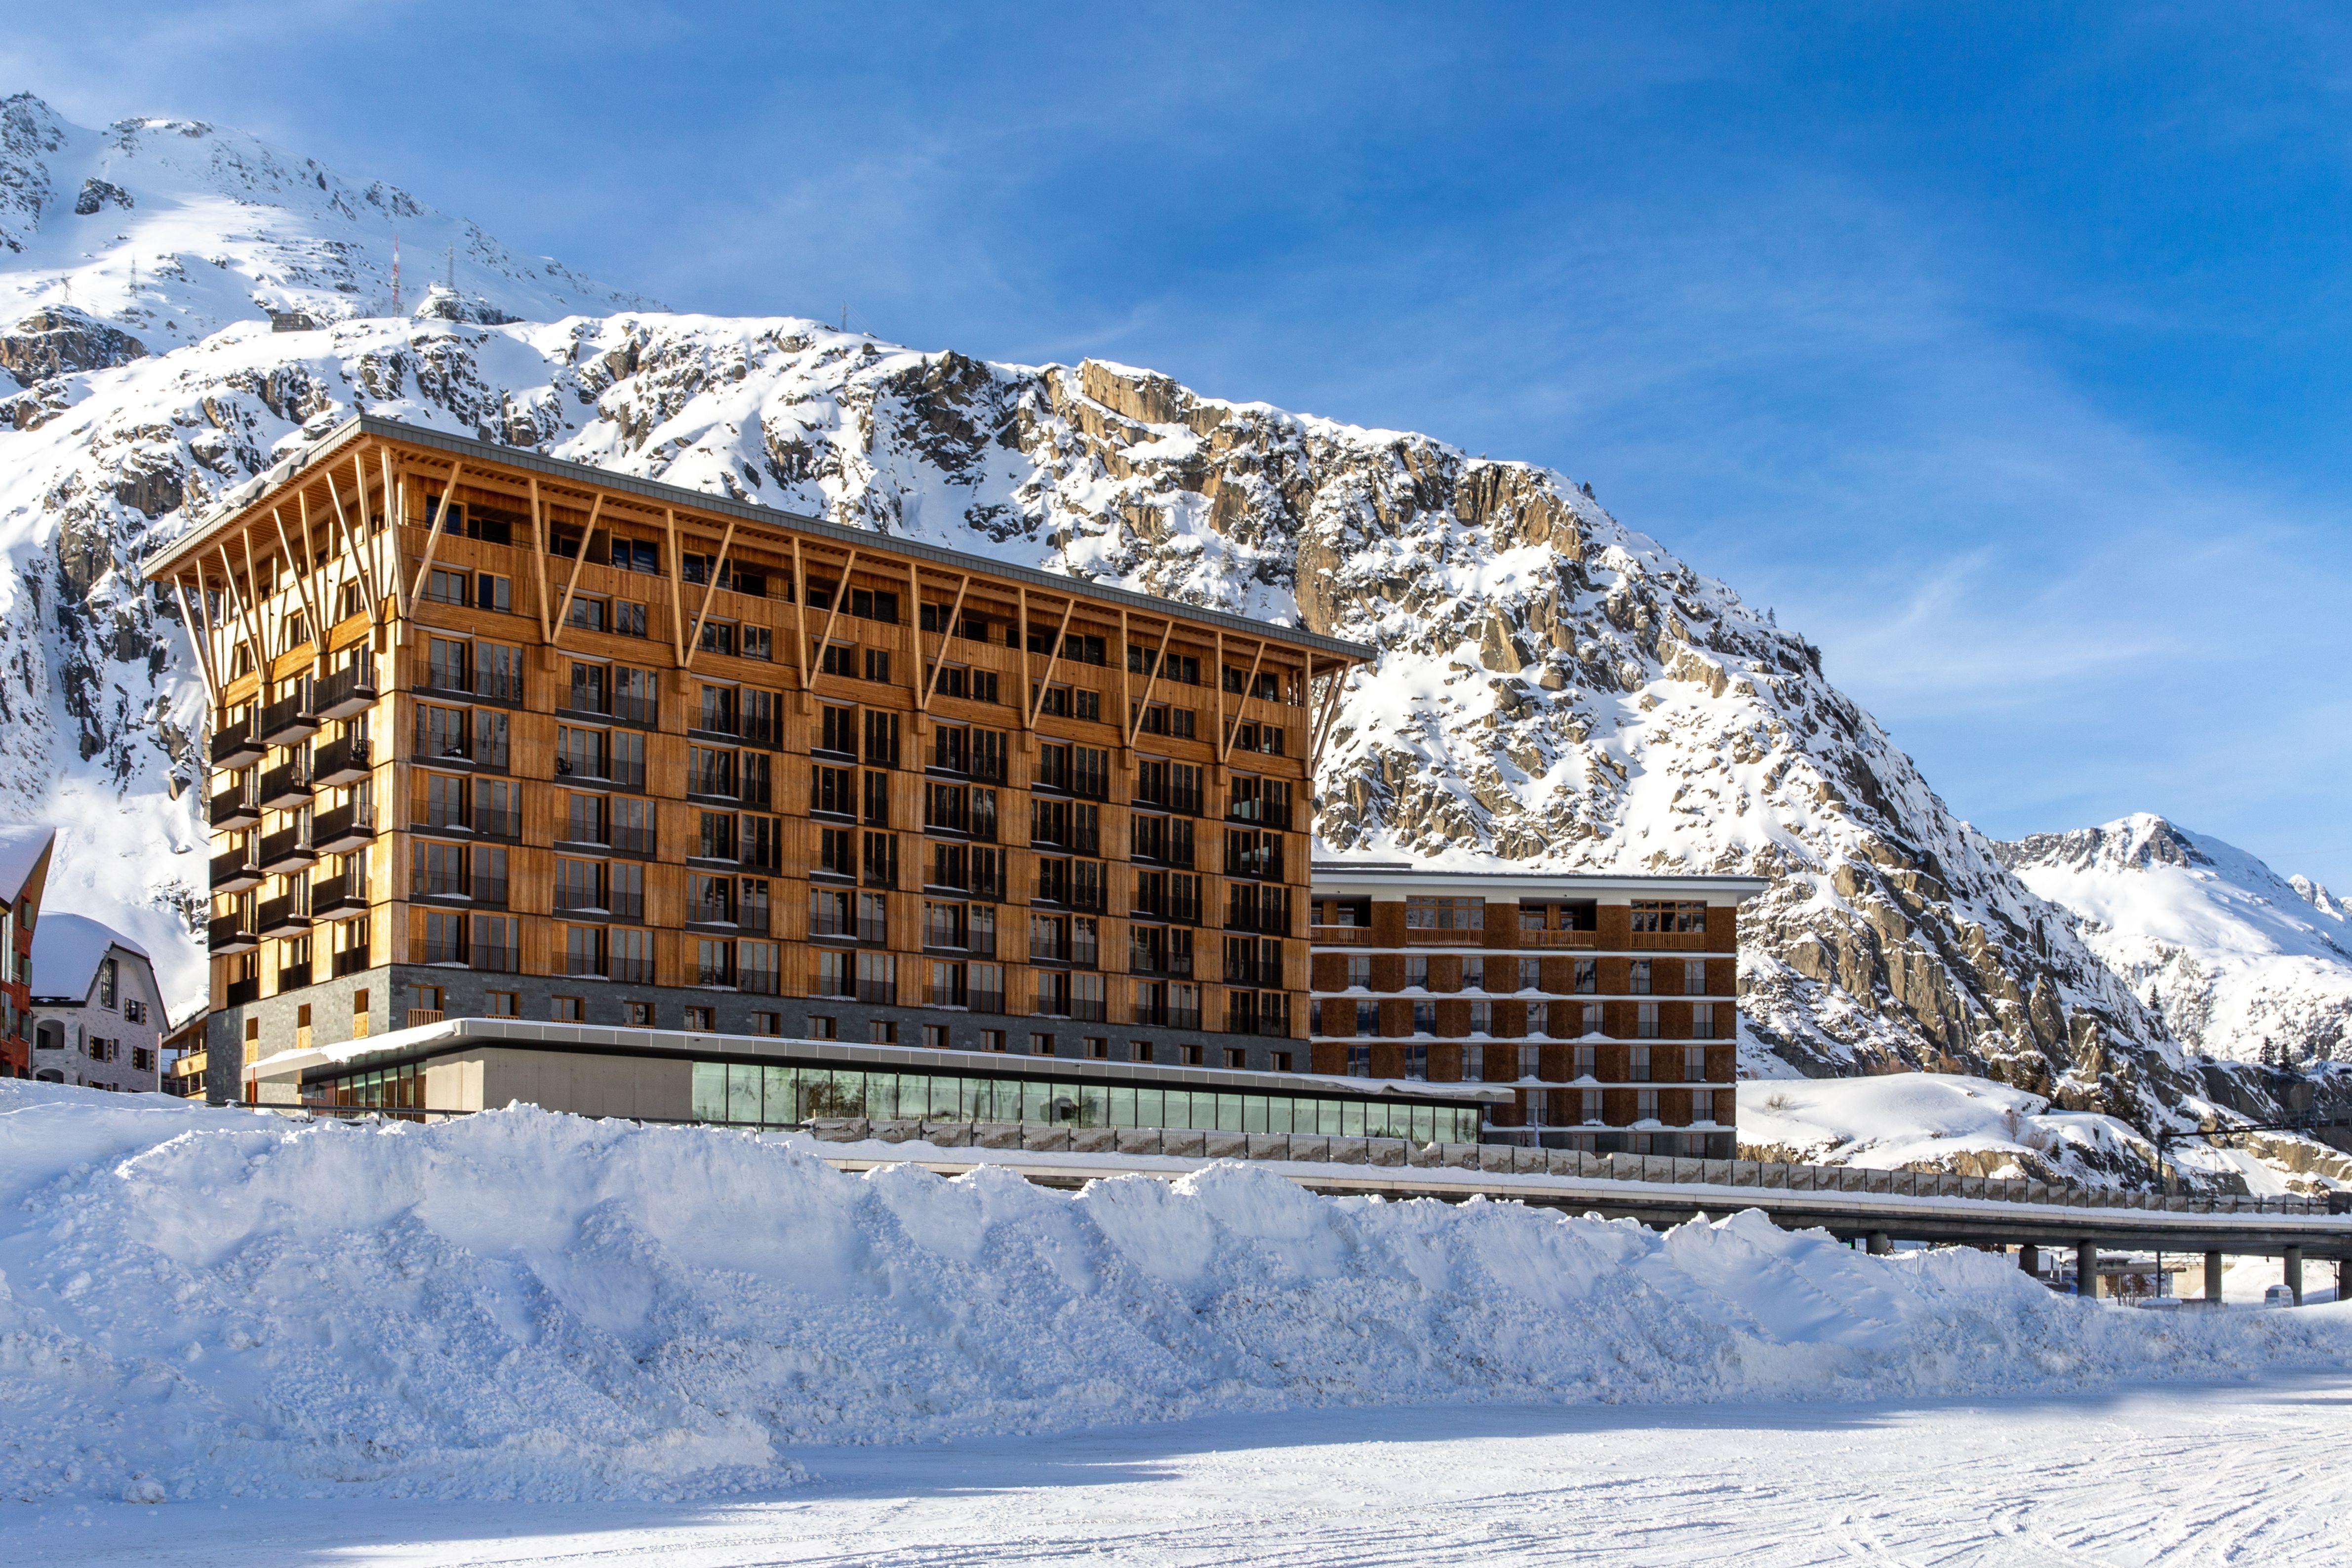 The Radisson Blu Hotel in Andermatt